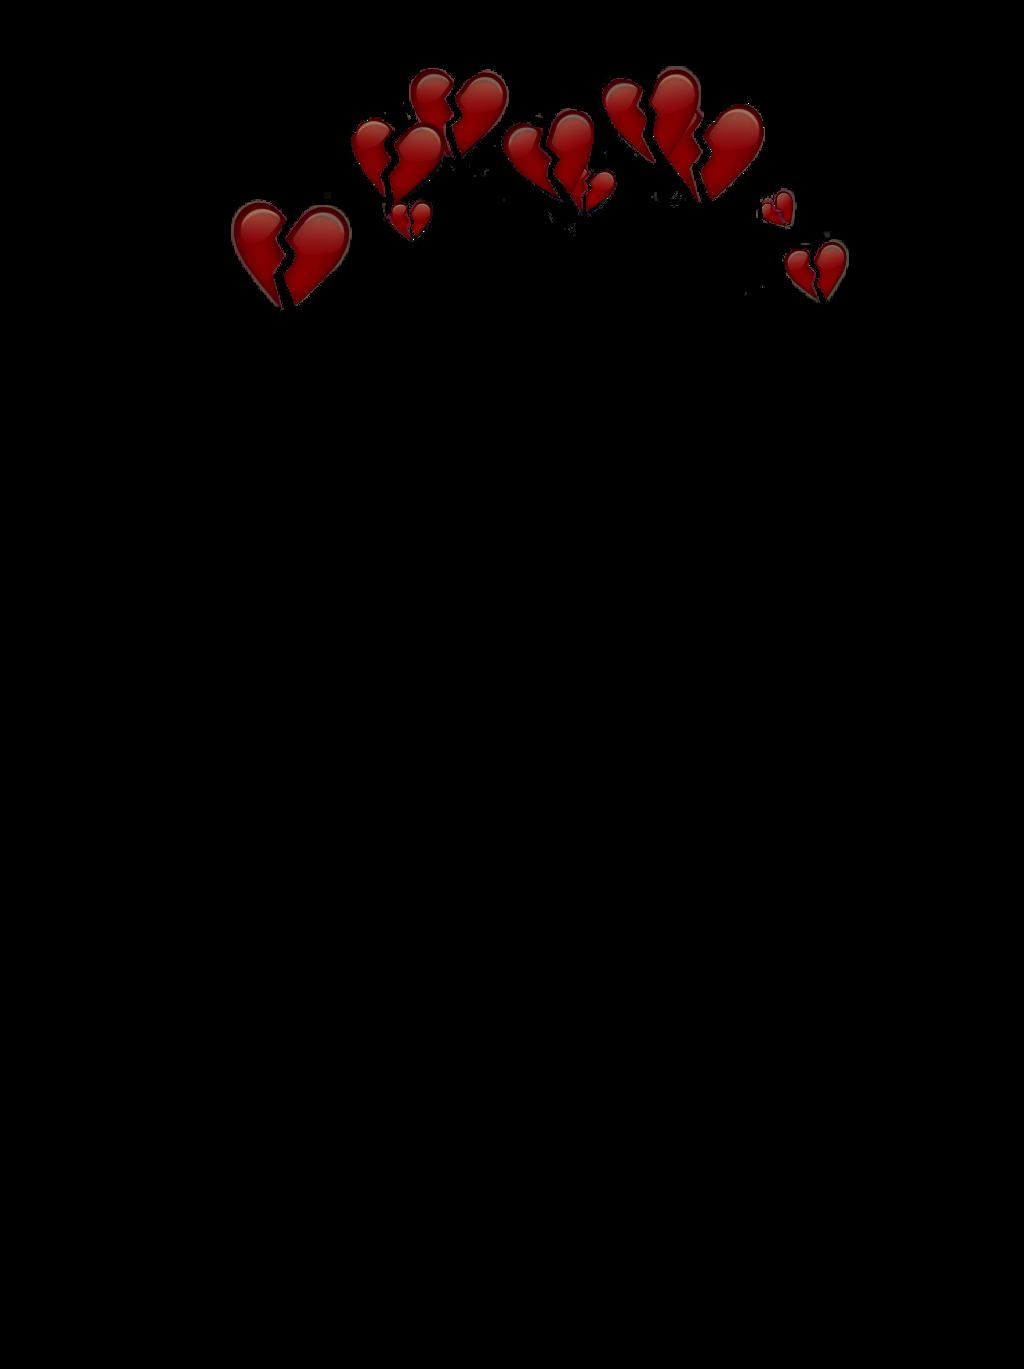 Broken crown clipart clip freeuse stock hearts broken emojis apple iphone crown brokenheart... clip freeuse stock